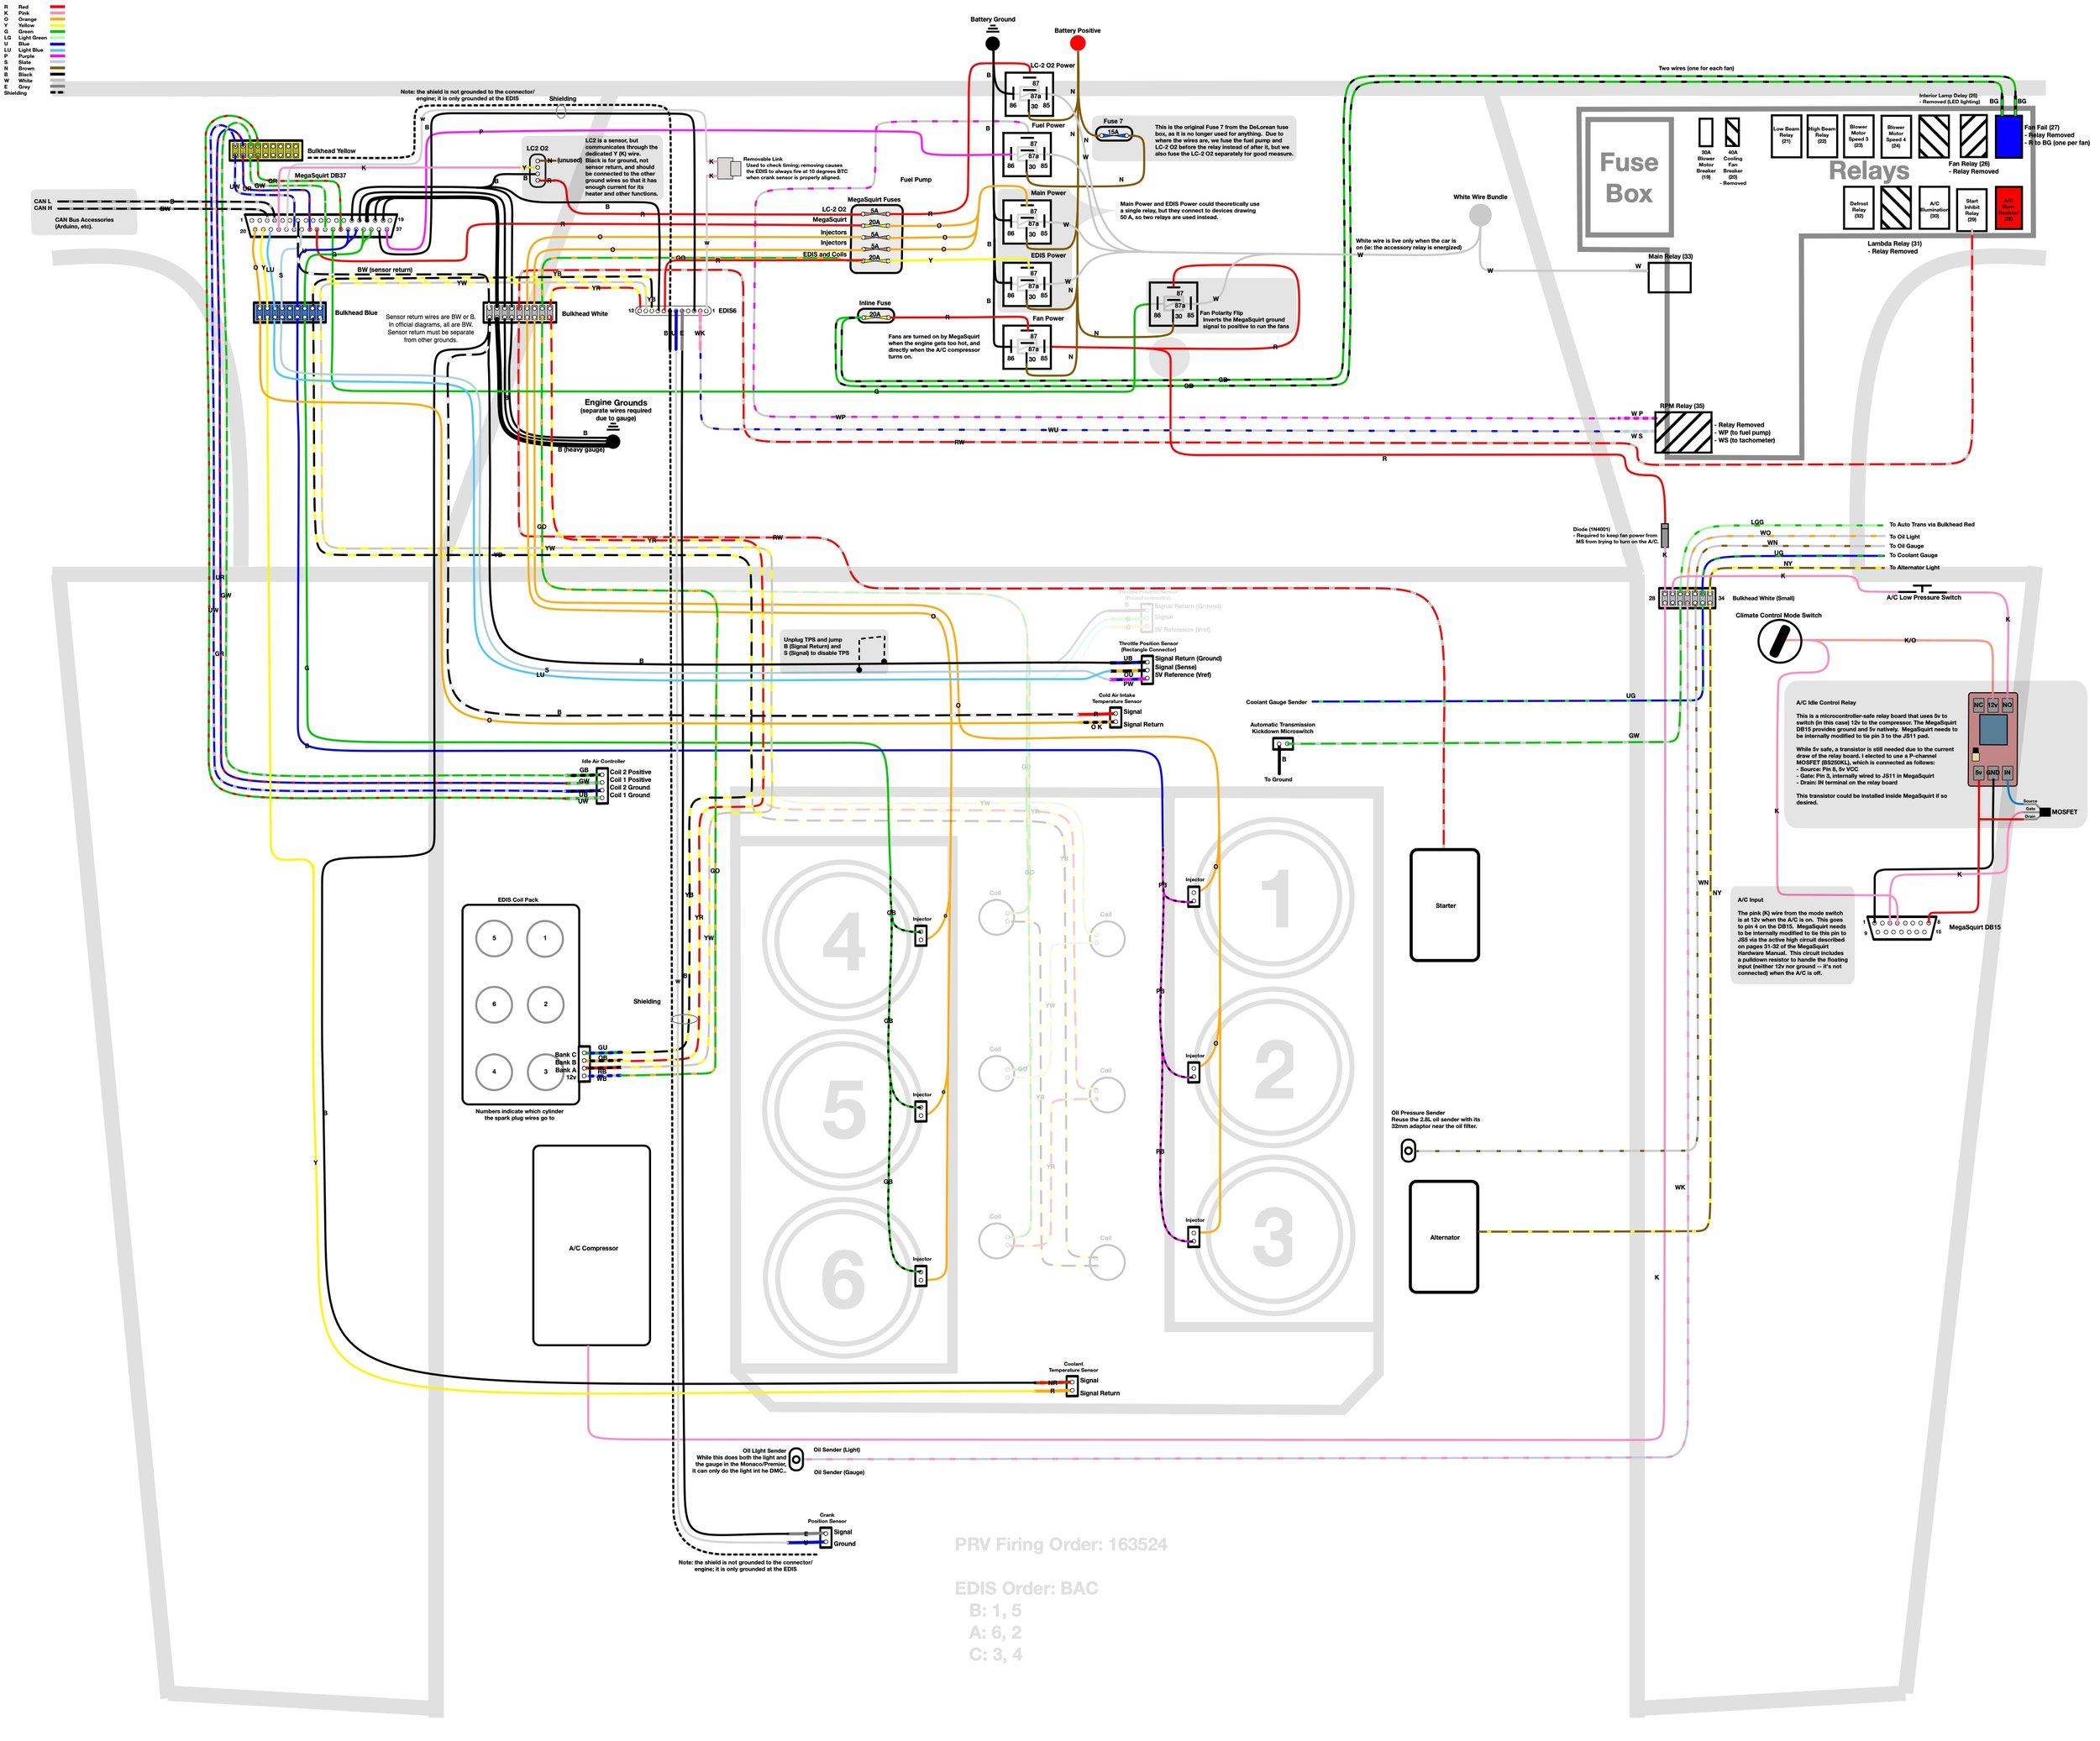 DeLorean+EFI+Wiring?formatd1500w fuel injector wiring diagram efcaviation com rjm injection wiring harness at honlapkeszites.co